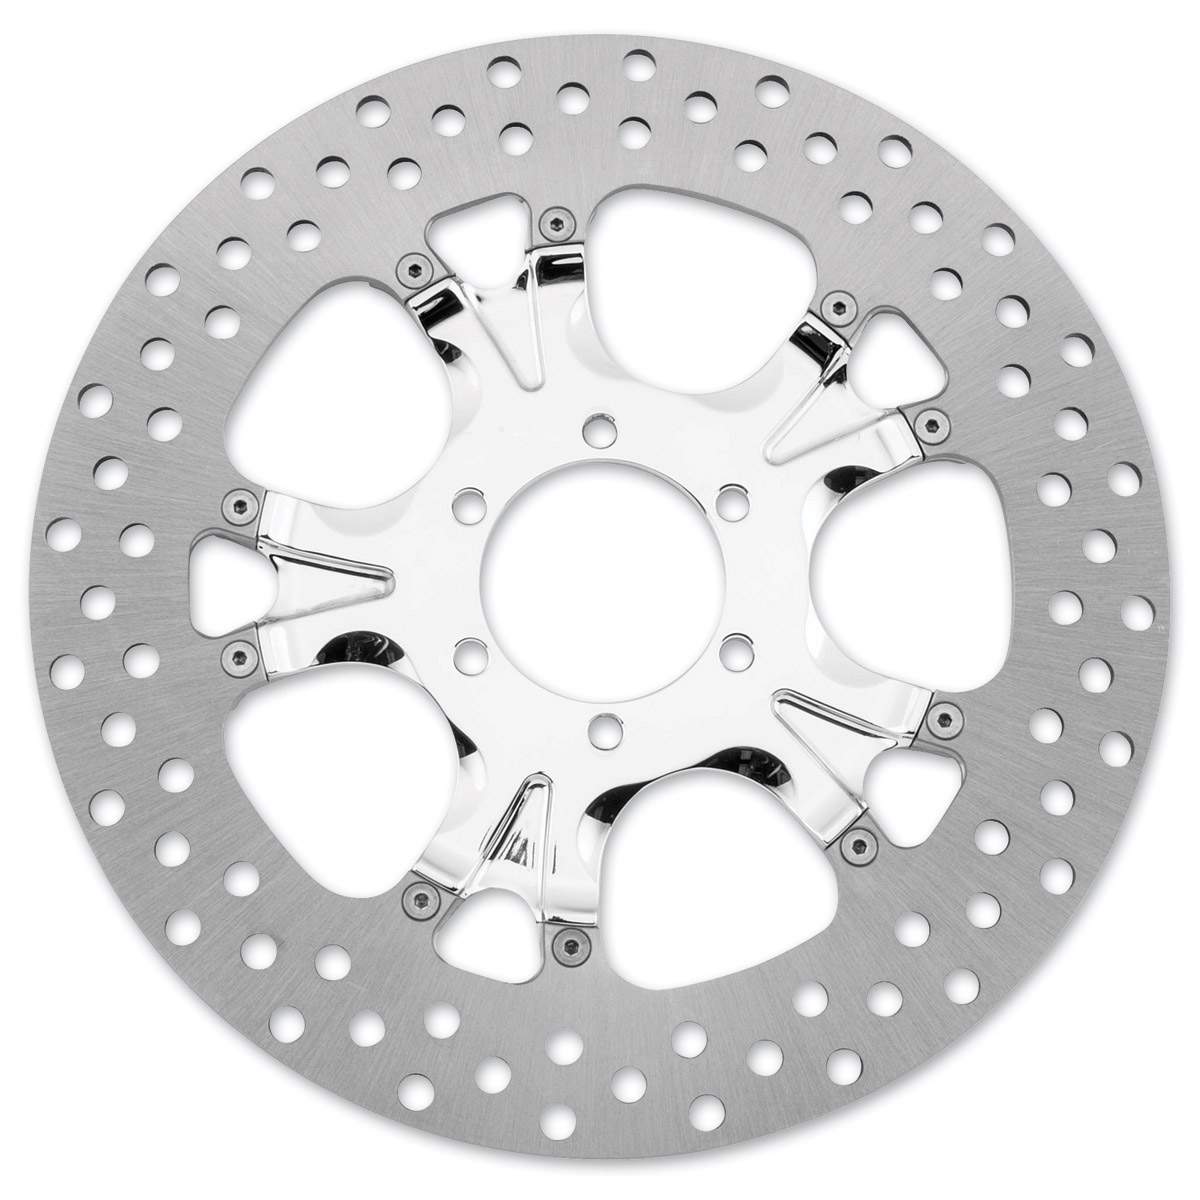 Performance Machine 11.8″ Gatlin Chrome Front/Rear Brake Rotor